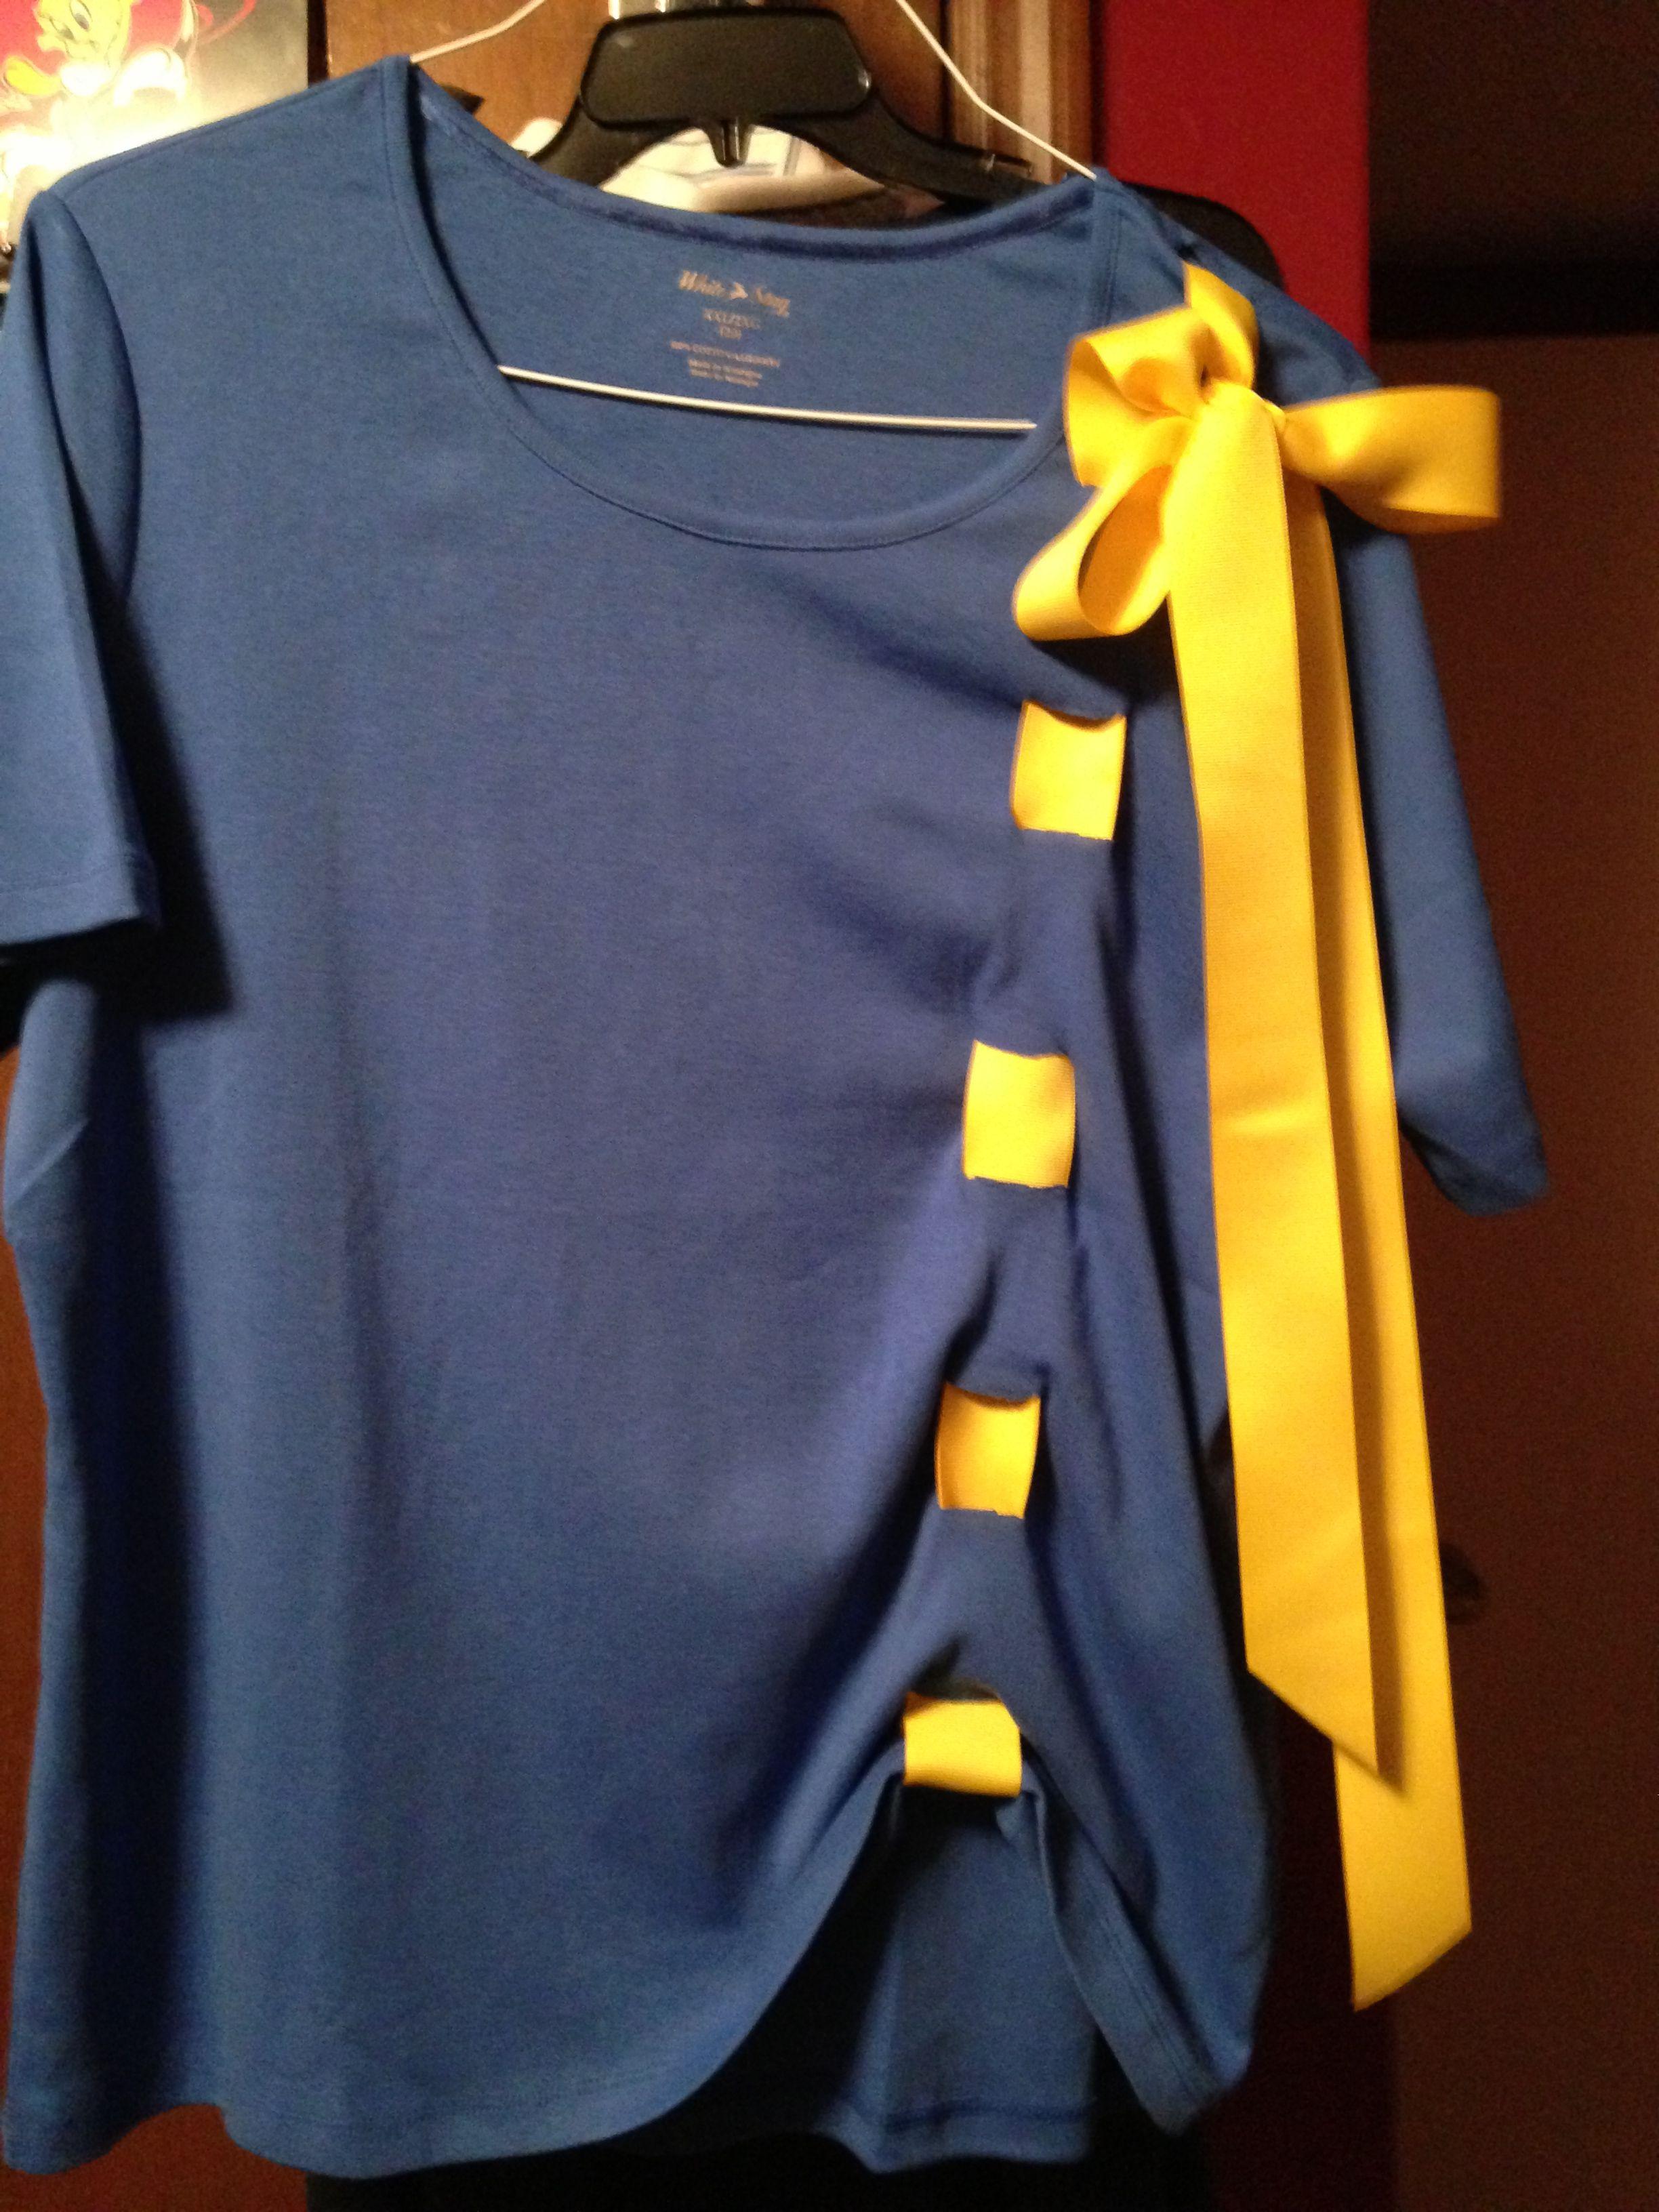 School spirit shirt would look good in orange and black | just fun | Pinterest | School spirit ...